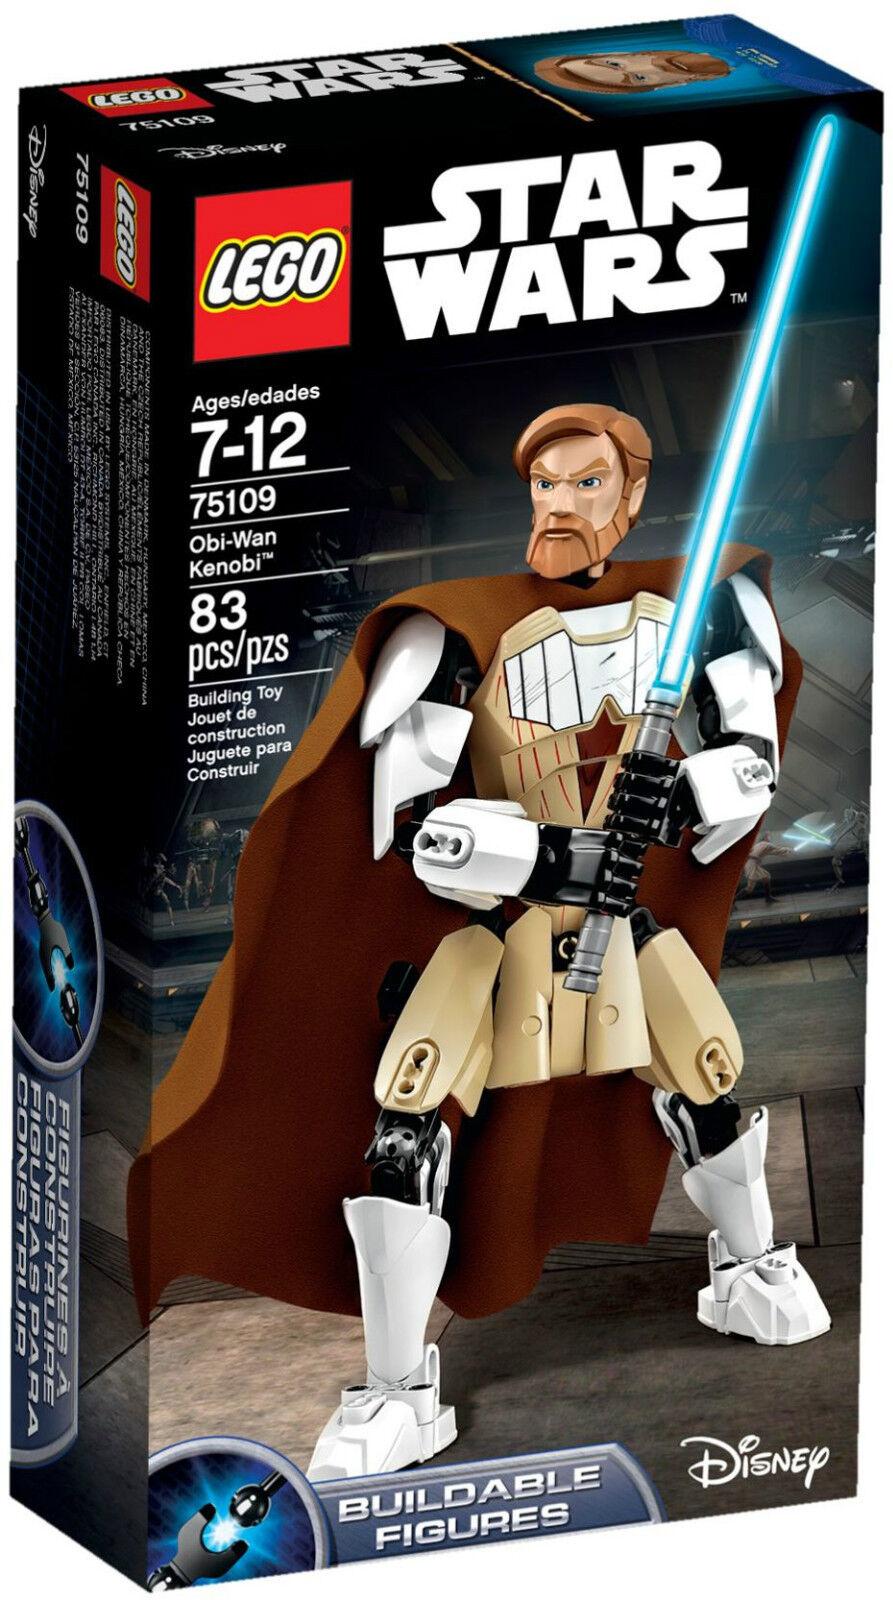 LEGO Star Wars 75109  Obi-Wan Kenobi - Brand New